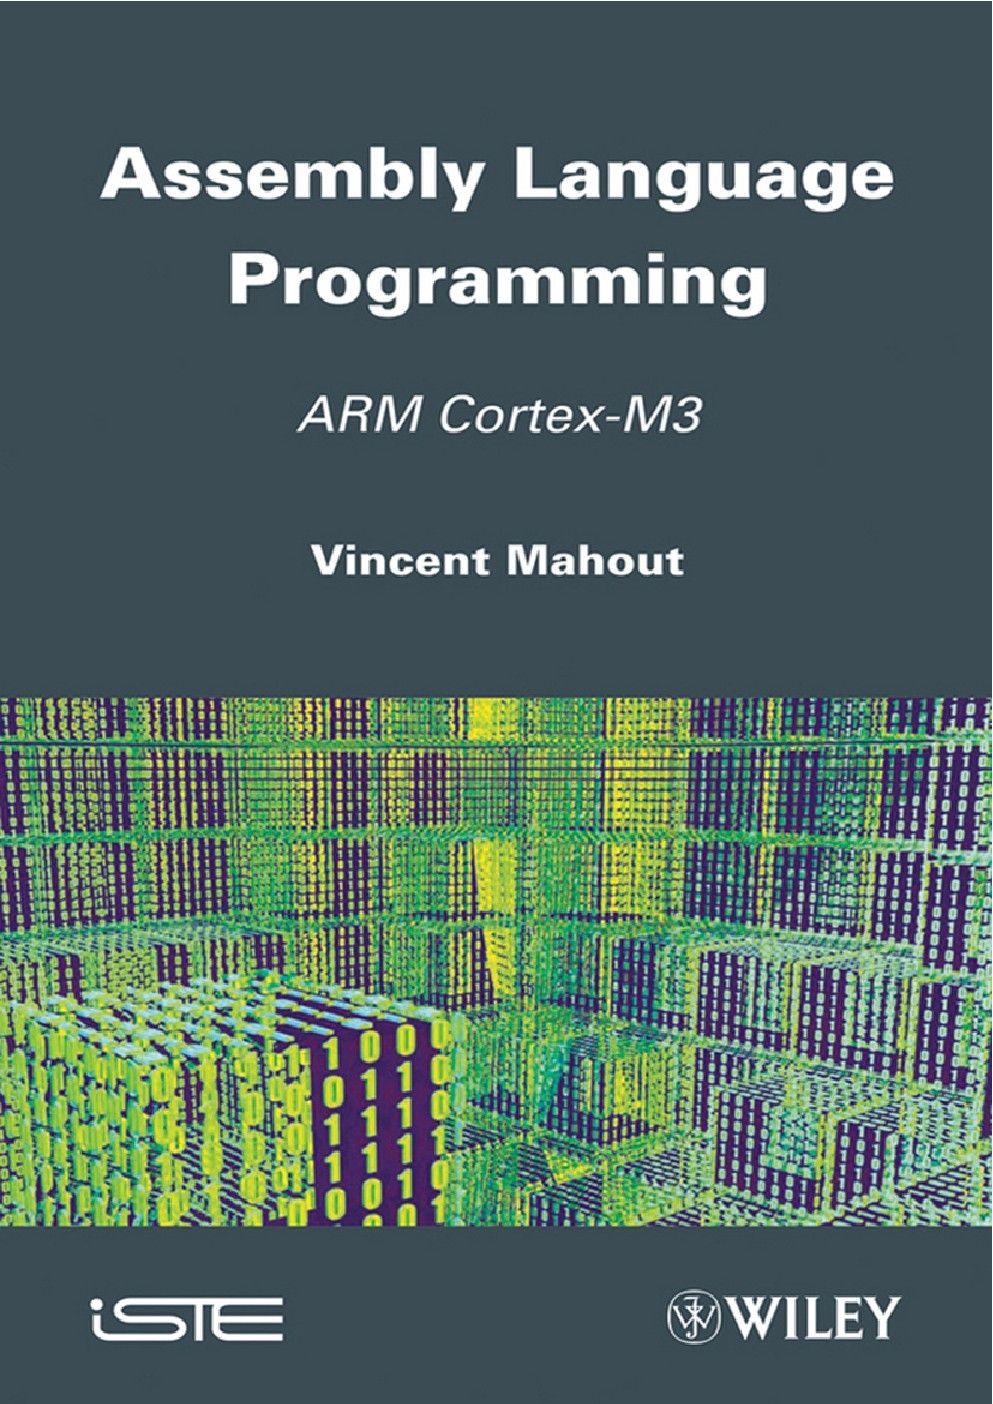 Assembly Language Programming: ARM Cortex-M3 | Ebook-dl